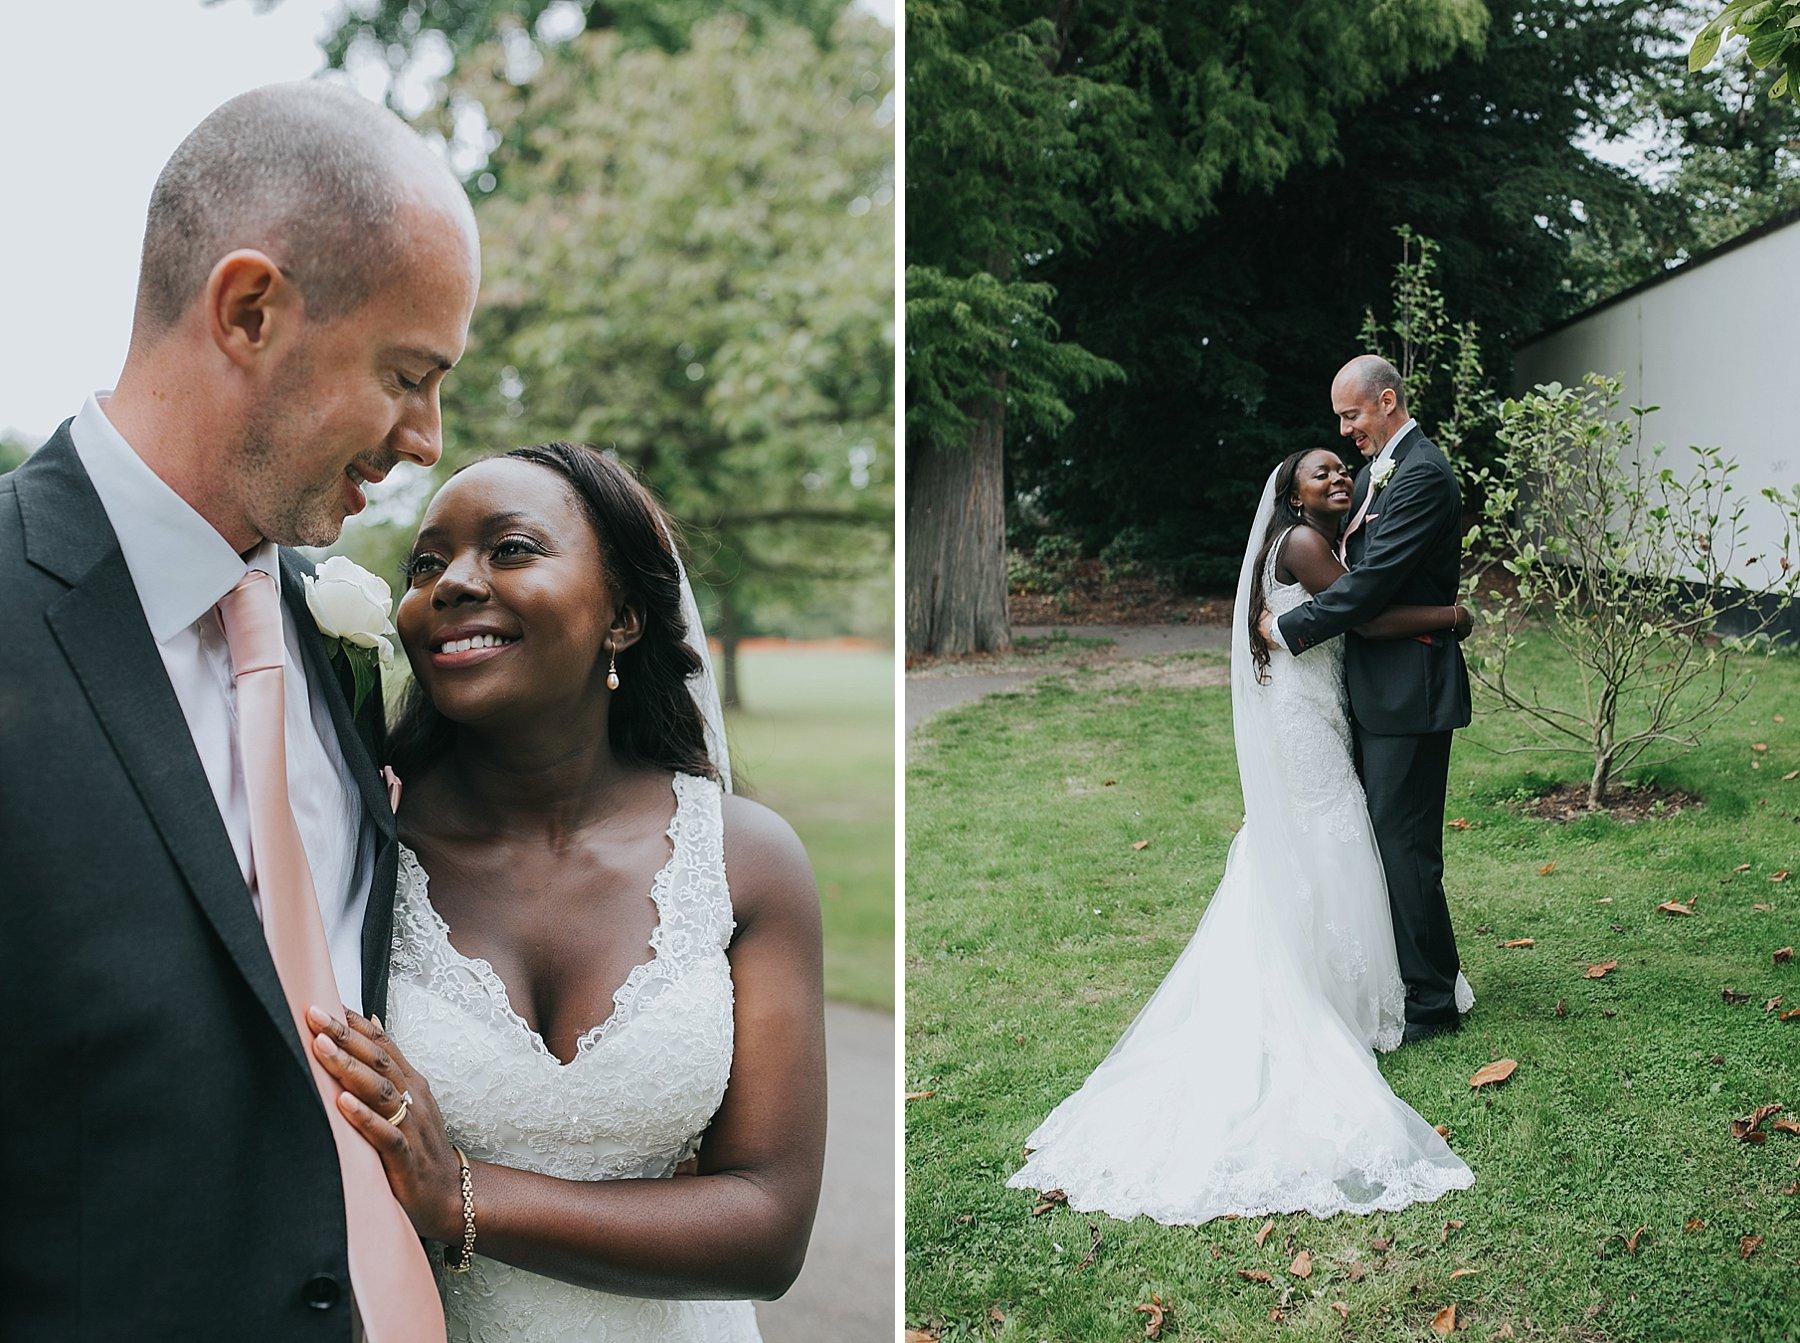 233-Belair House Dulwich wedding portraits bride embracing groom.jpg